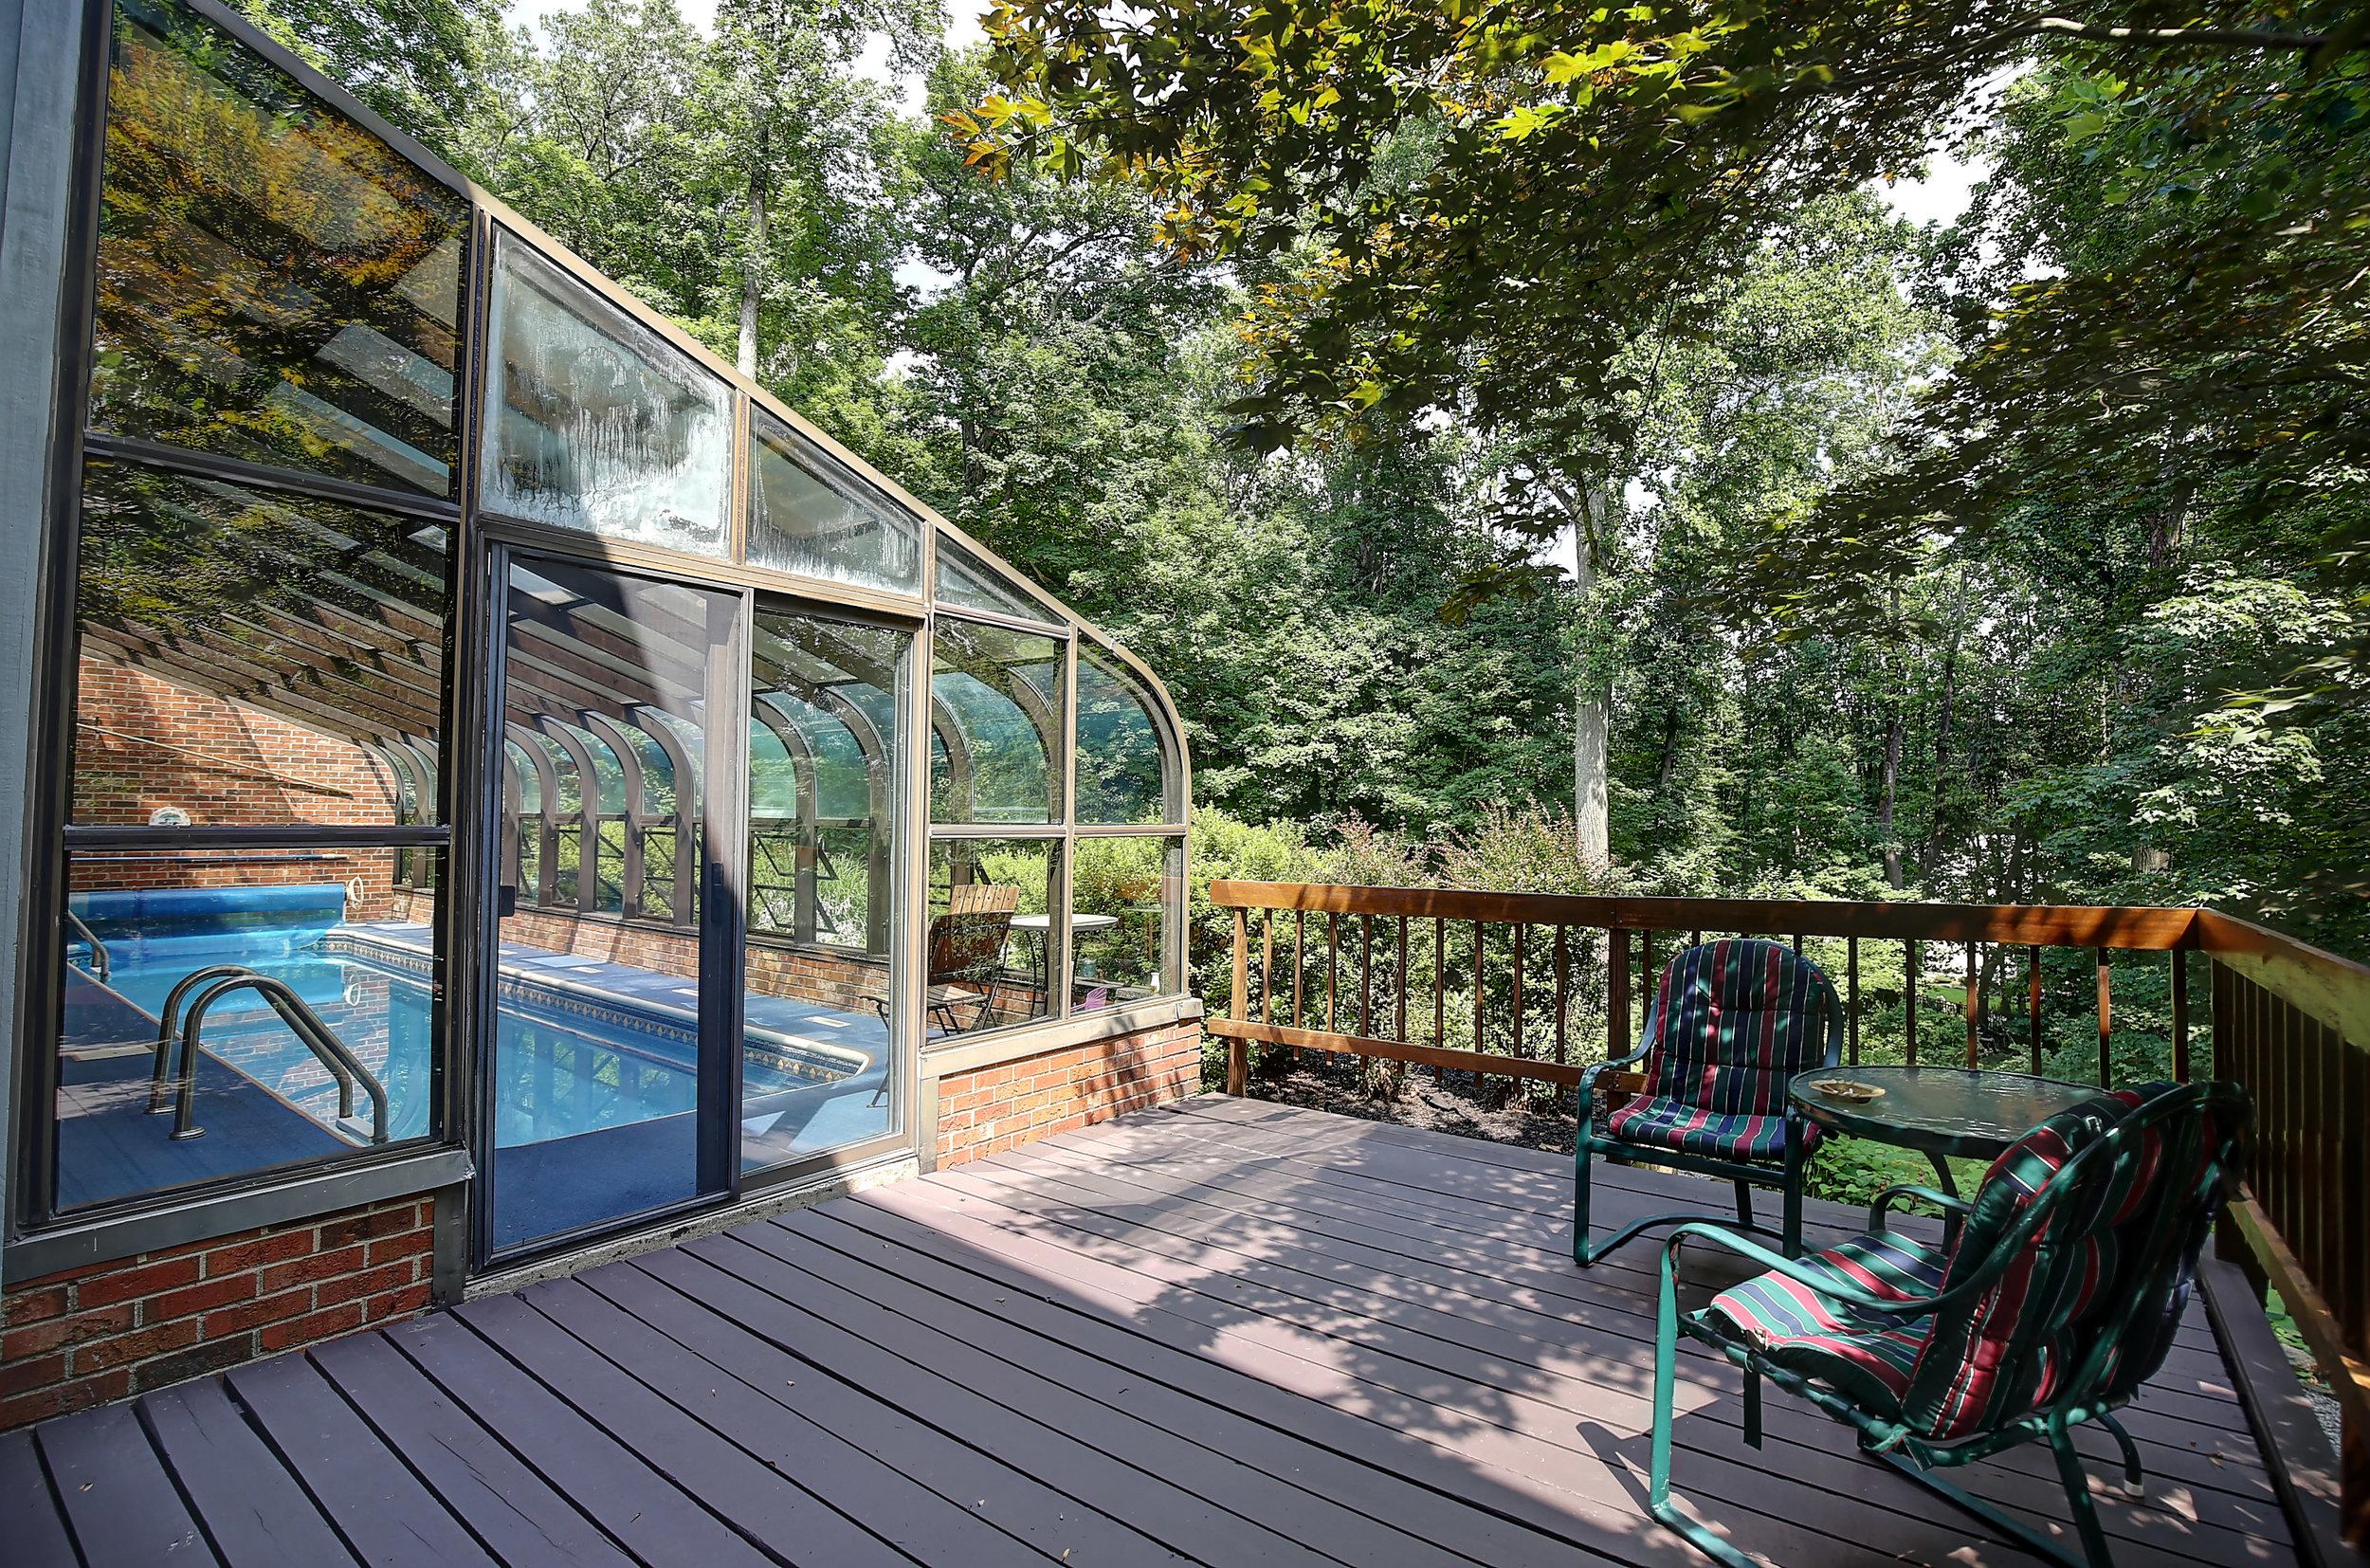 6 Lap pool and wrap-around deck IMG_6372_3_4.jpg